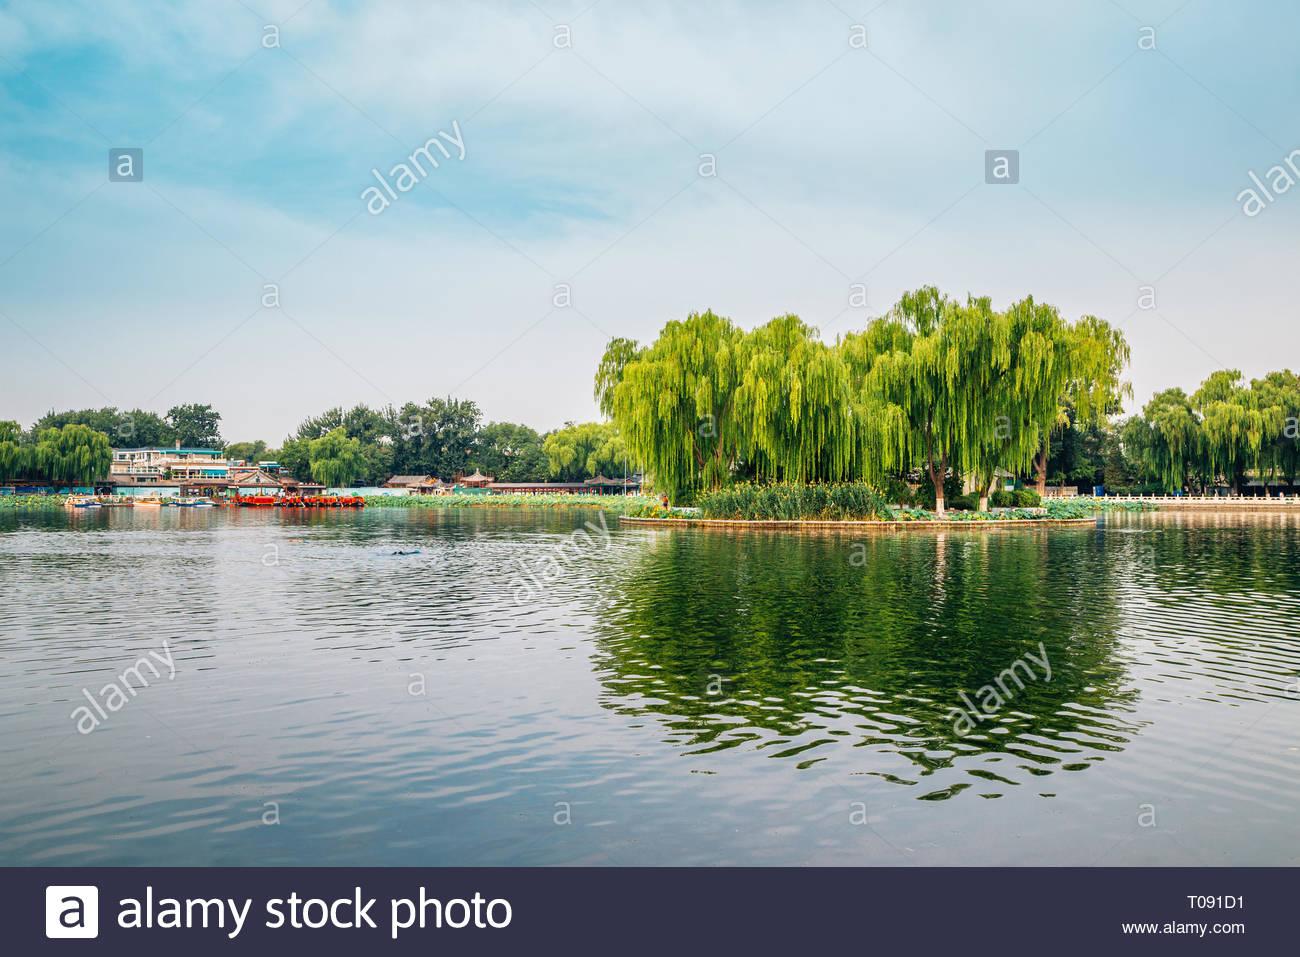 Shichahai Qianhai lake in Beijing, China - Stock Image